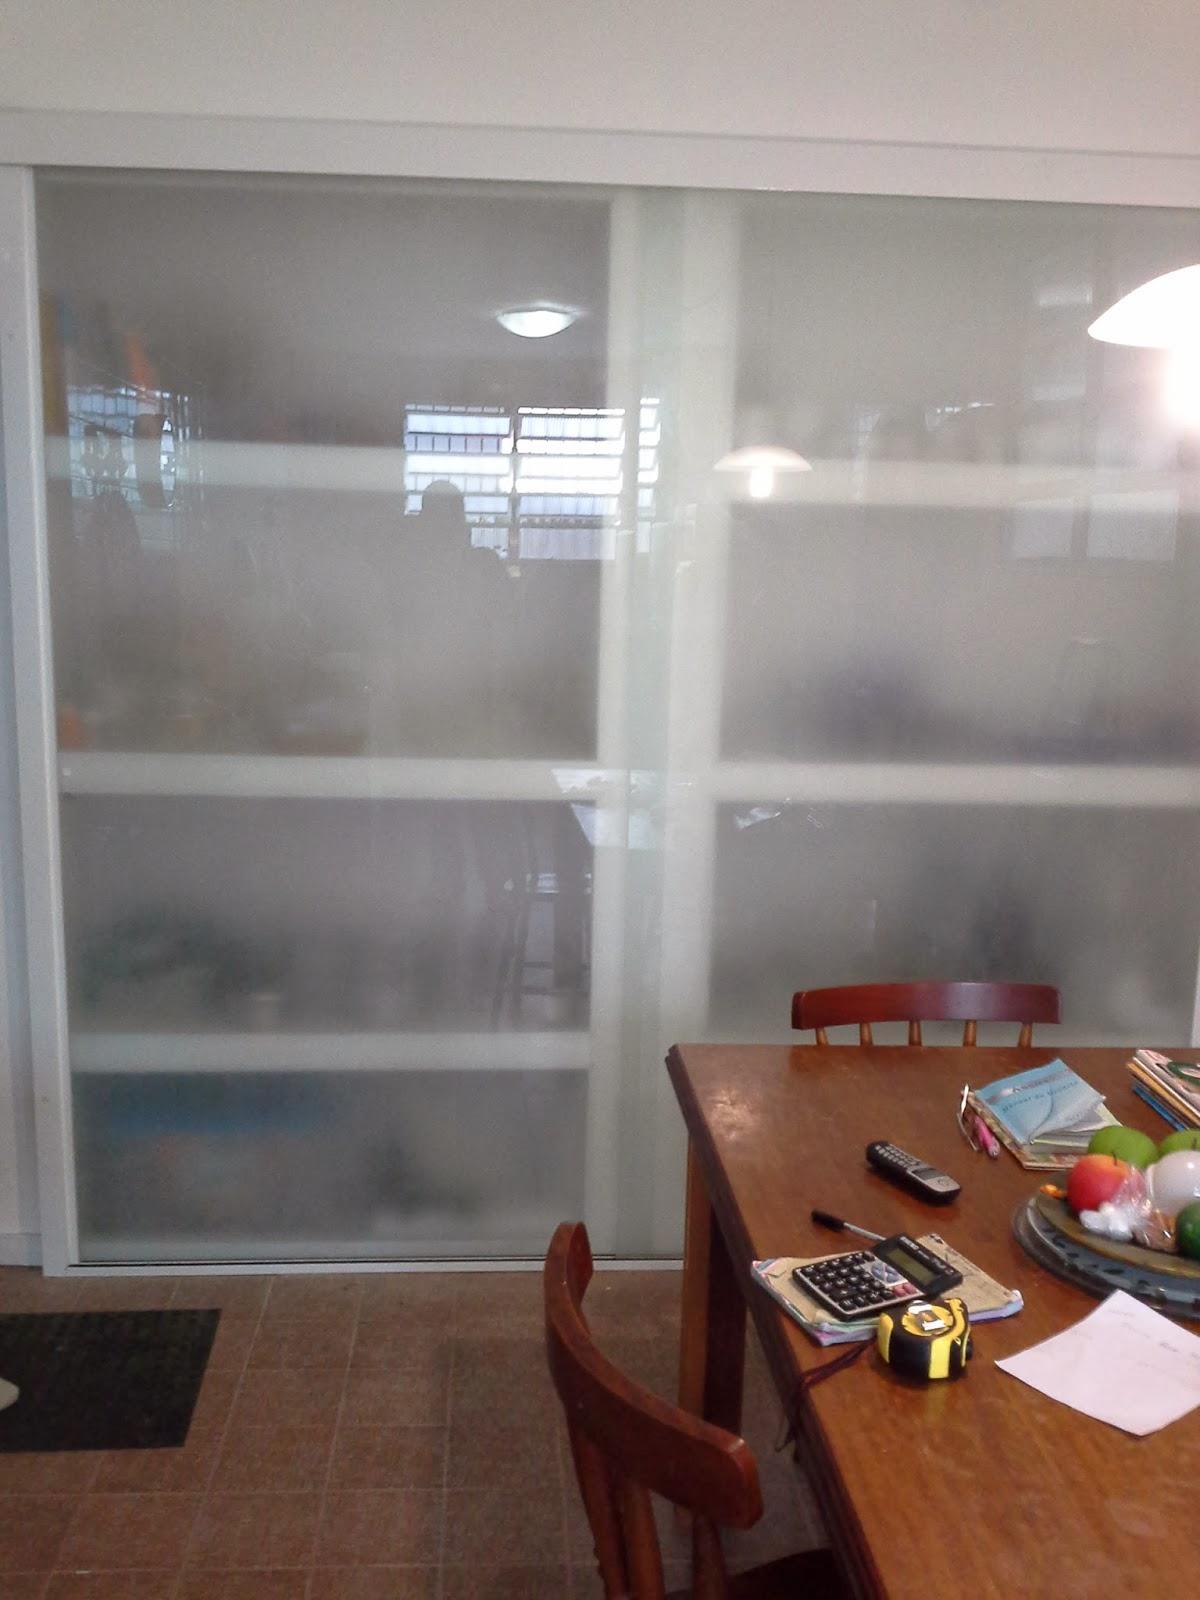 AF4 TEMPER VIDROS Armario de cozinha vidro jateado sistema versatik -> Armario De Banheiro Com Vidro Jateado